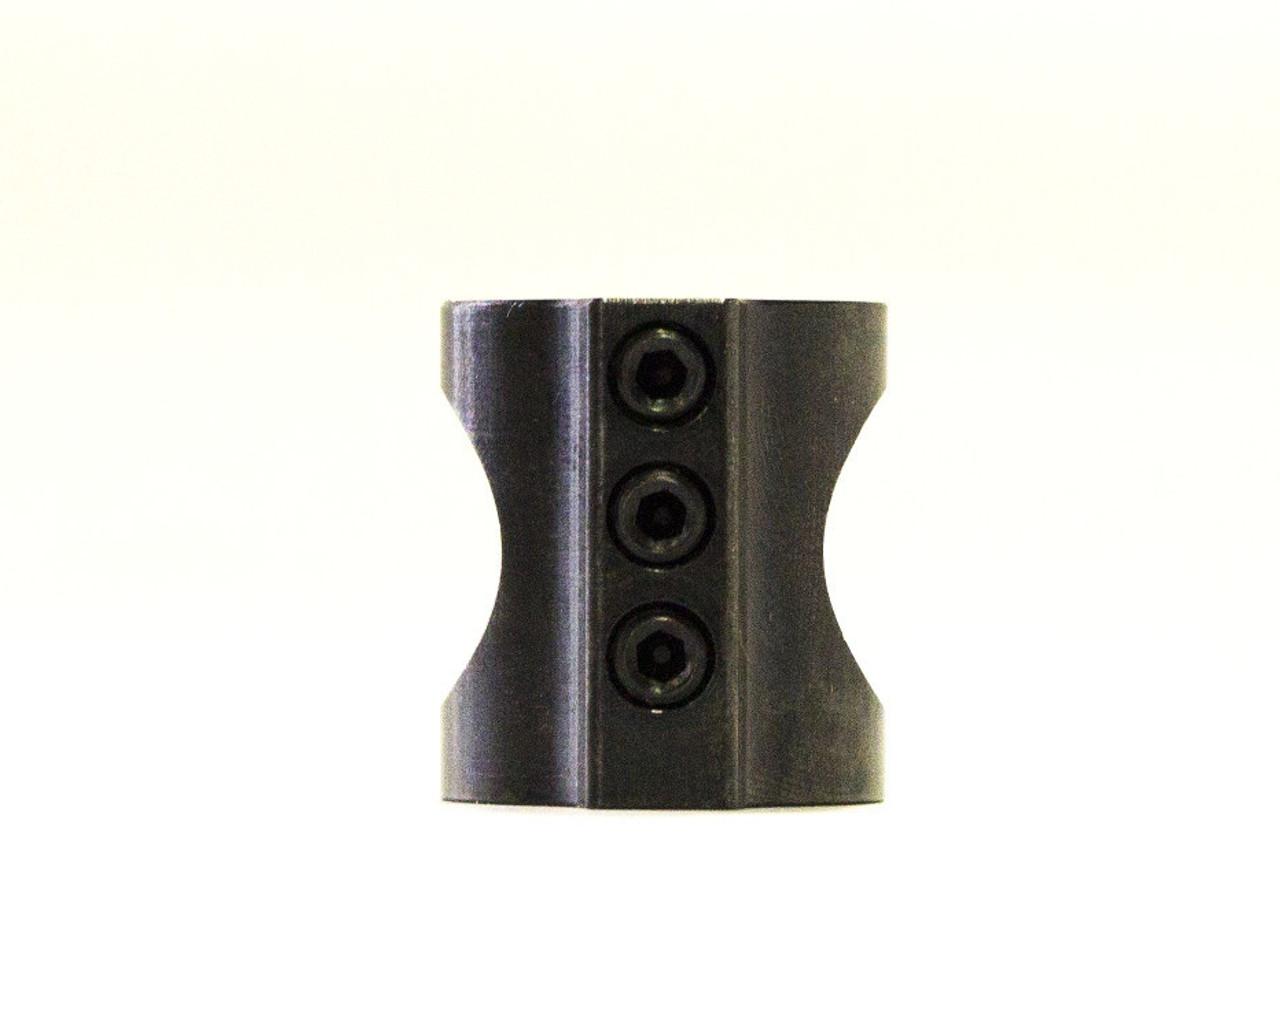 "Faxon .625"" Ultra Low-Profile Gas Block - Three Set Screws"